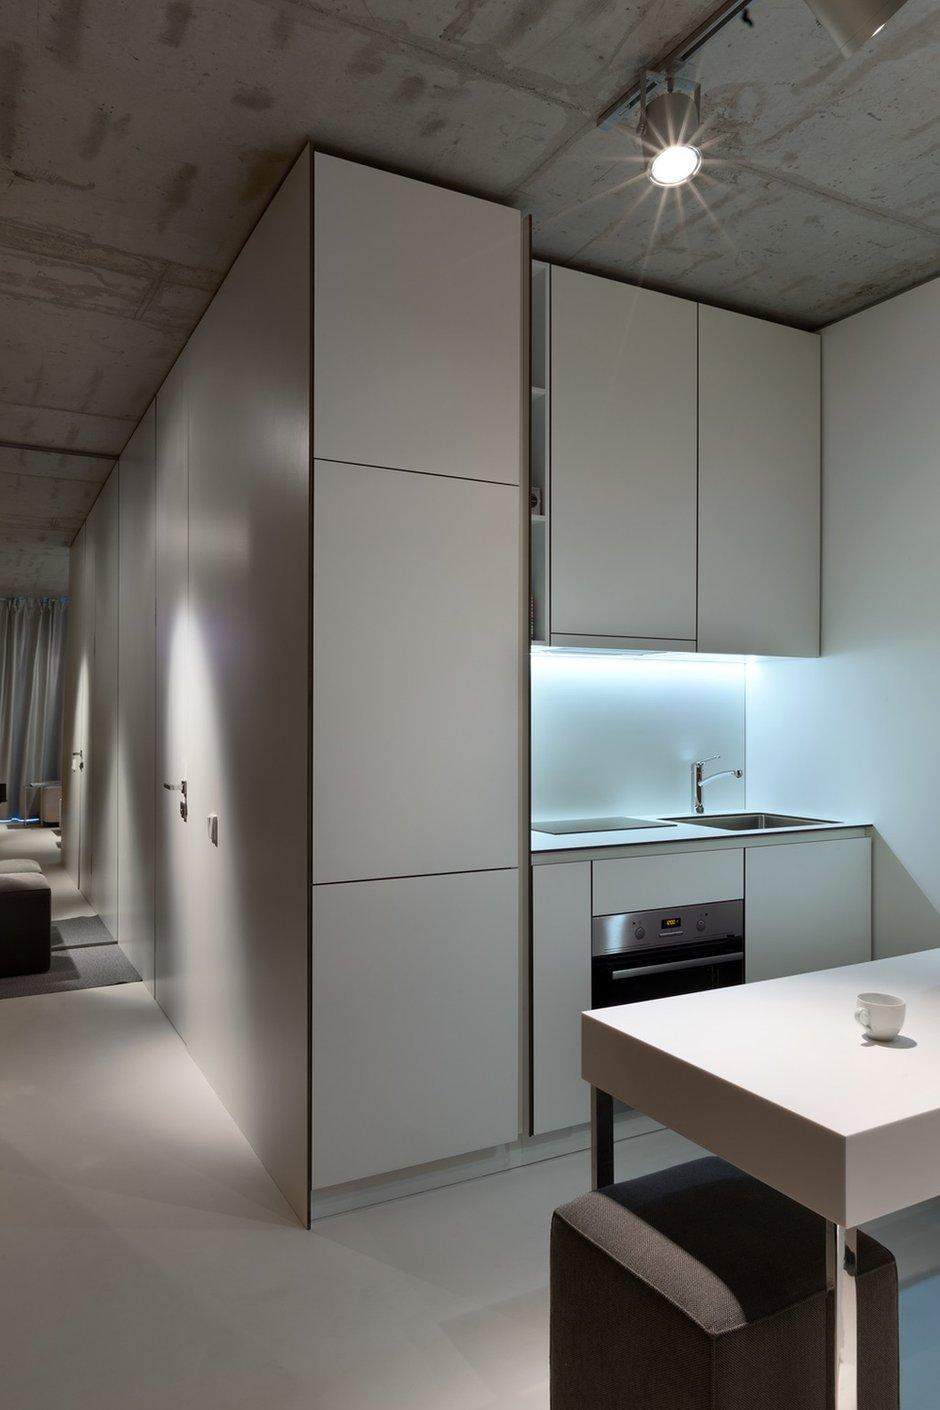 Фотография: Кухня и столовая в стиле Лофт, Малогабаритная квартира, Квартира, Украина, Дома и квартиры – фото на INMYROOM